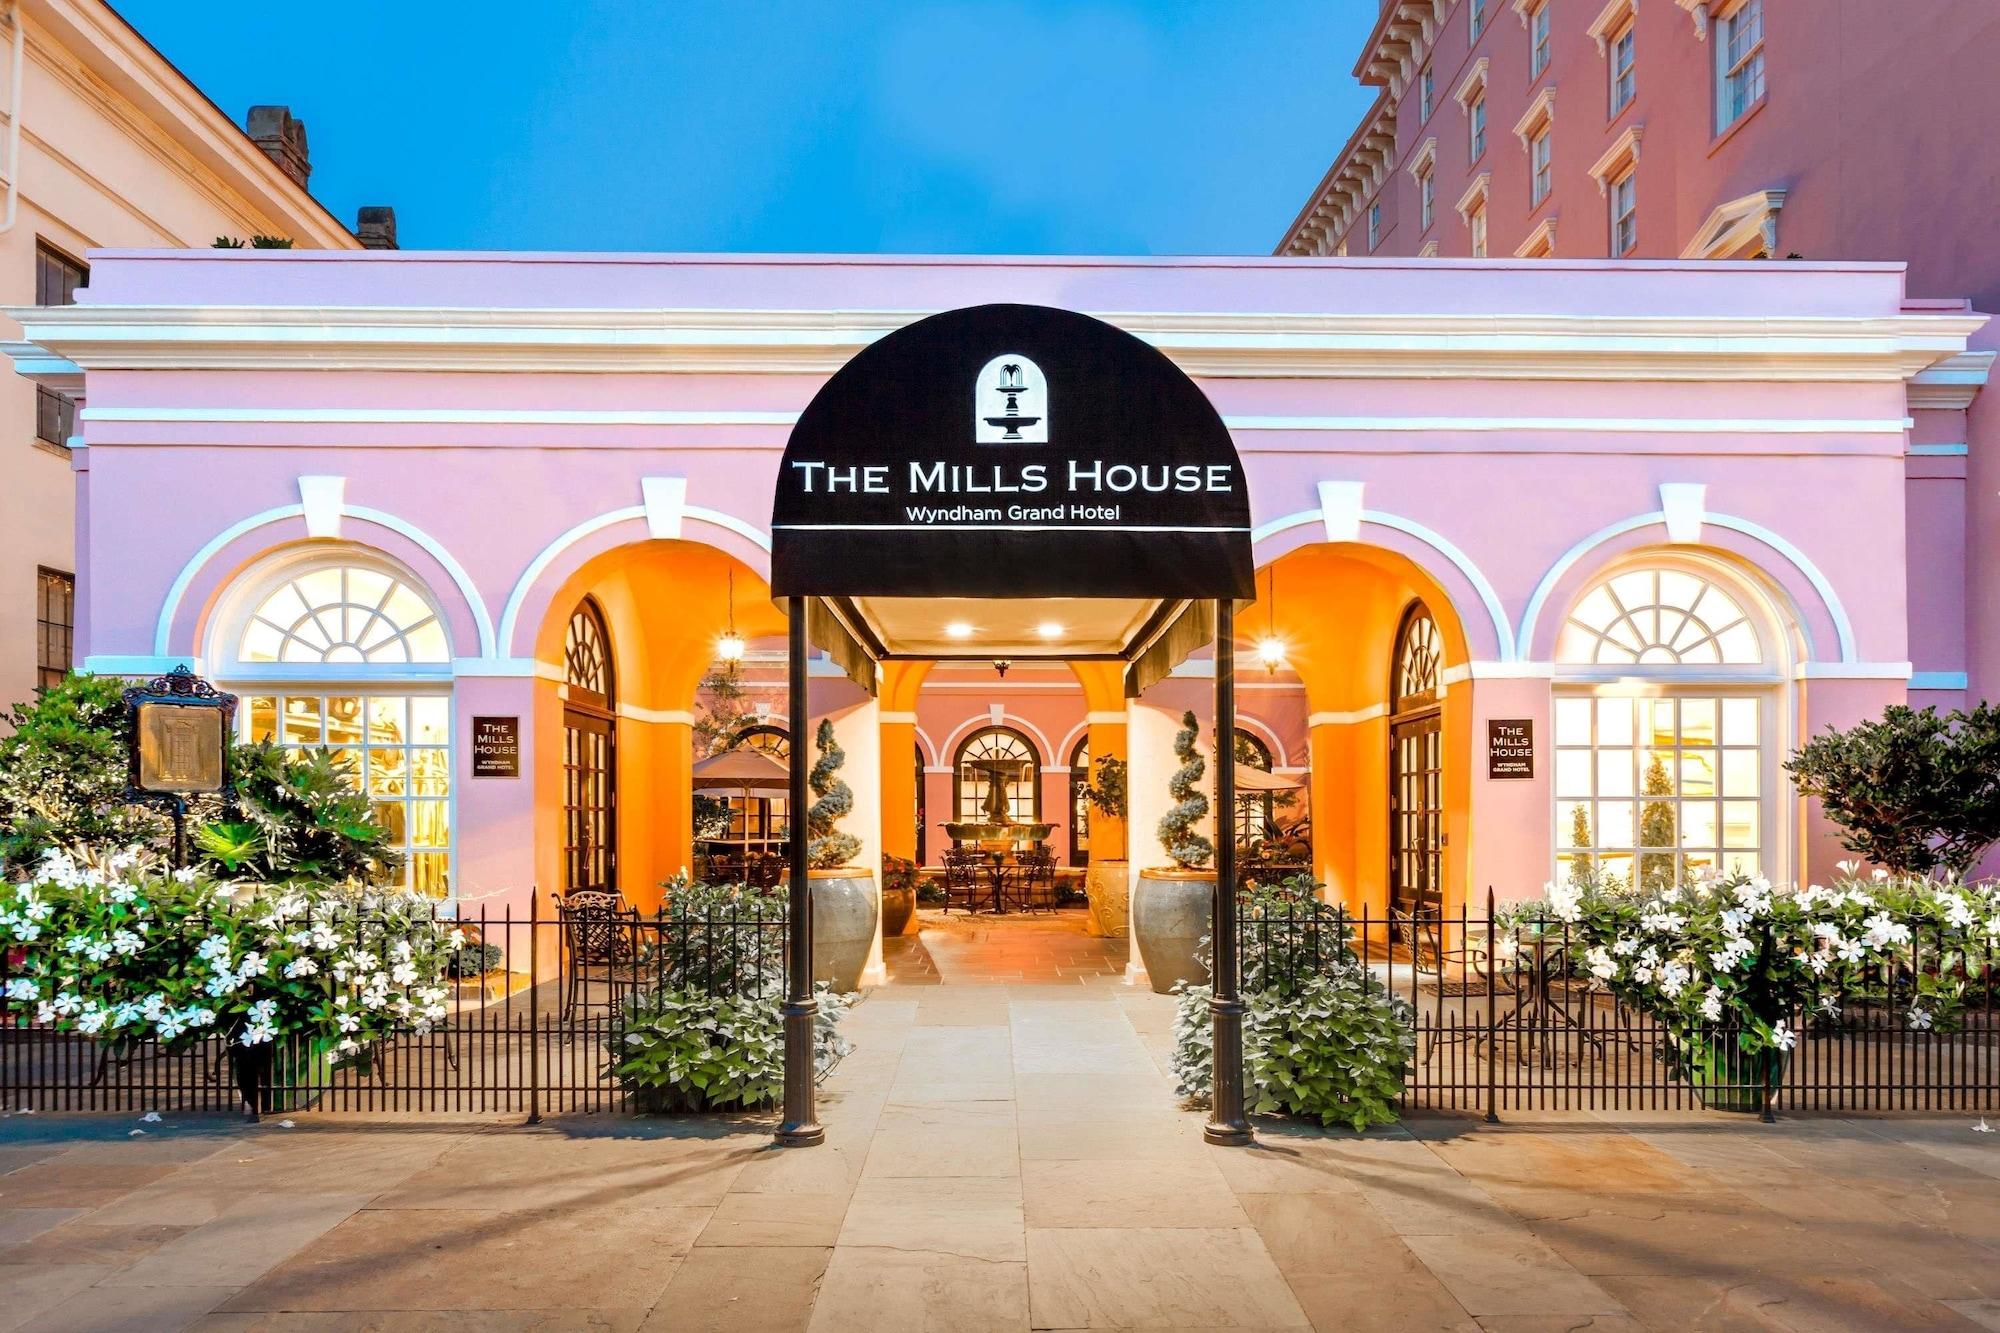 The Mills House Wyndham Grand Hotel, Charleston